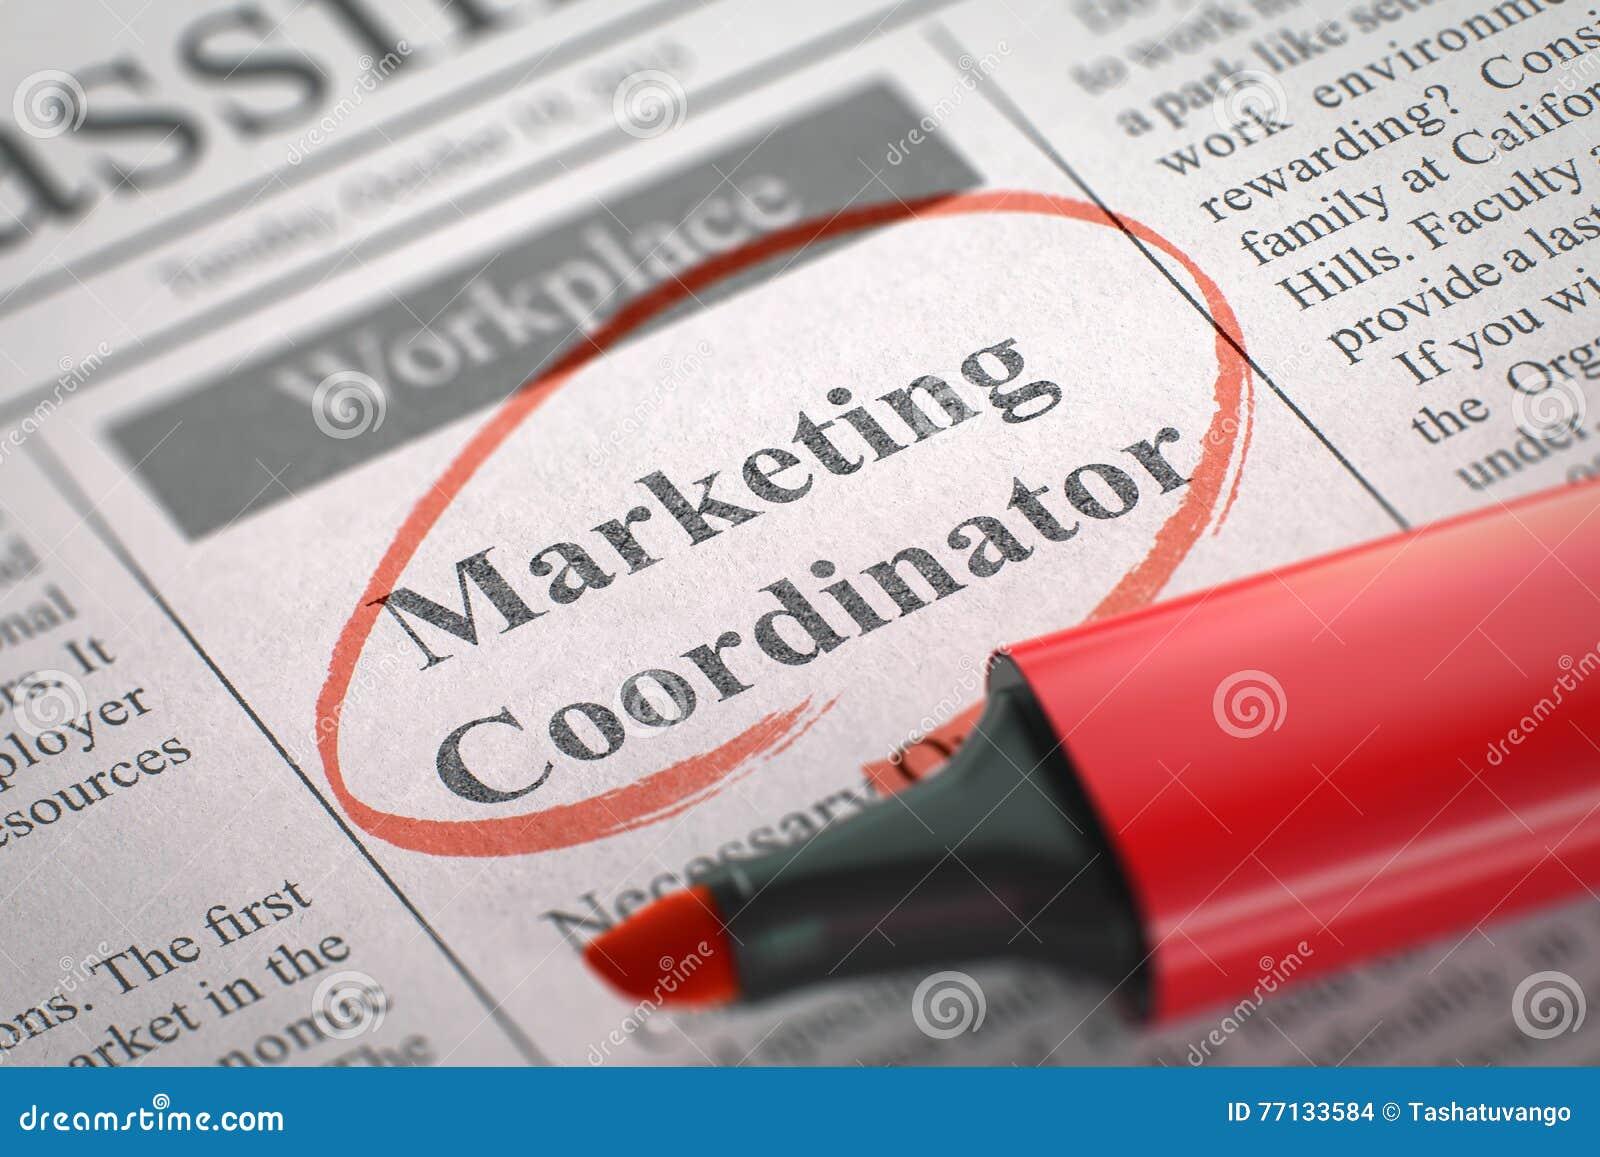 Marketing Coordinator Job Vacancy  3D Illustration  Stock